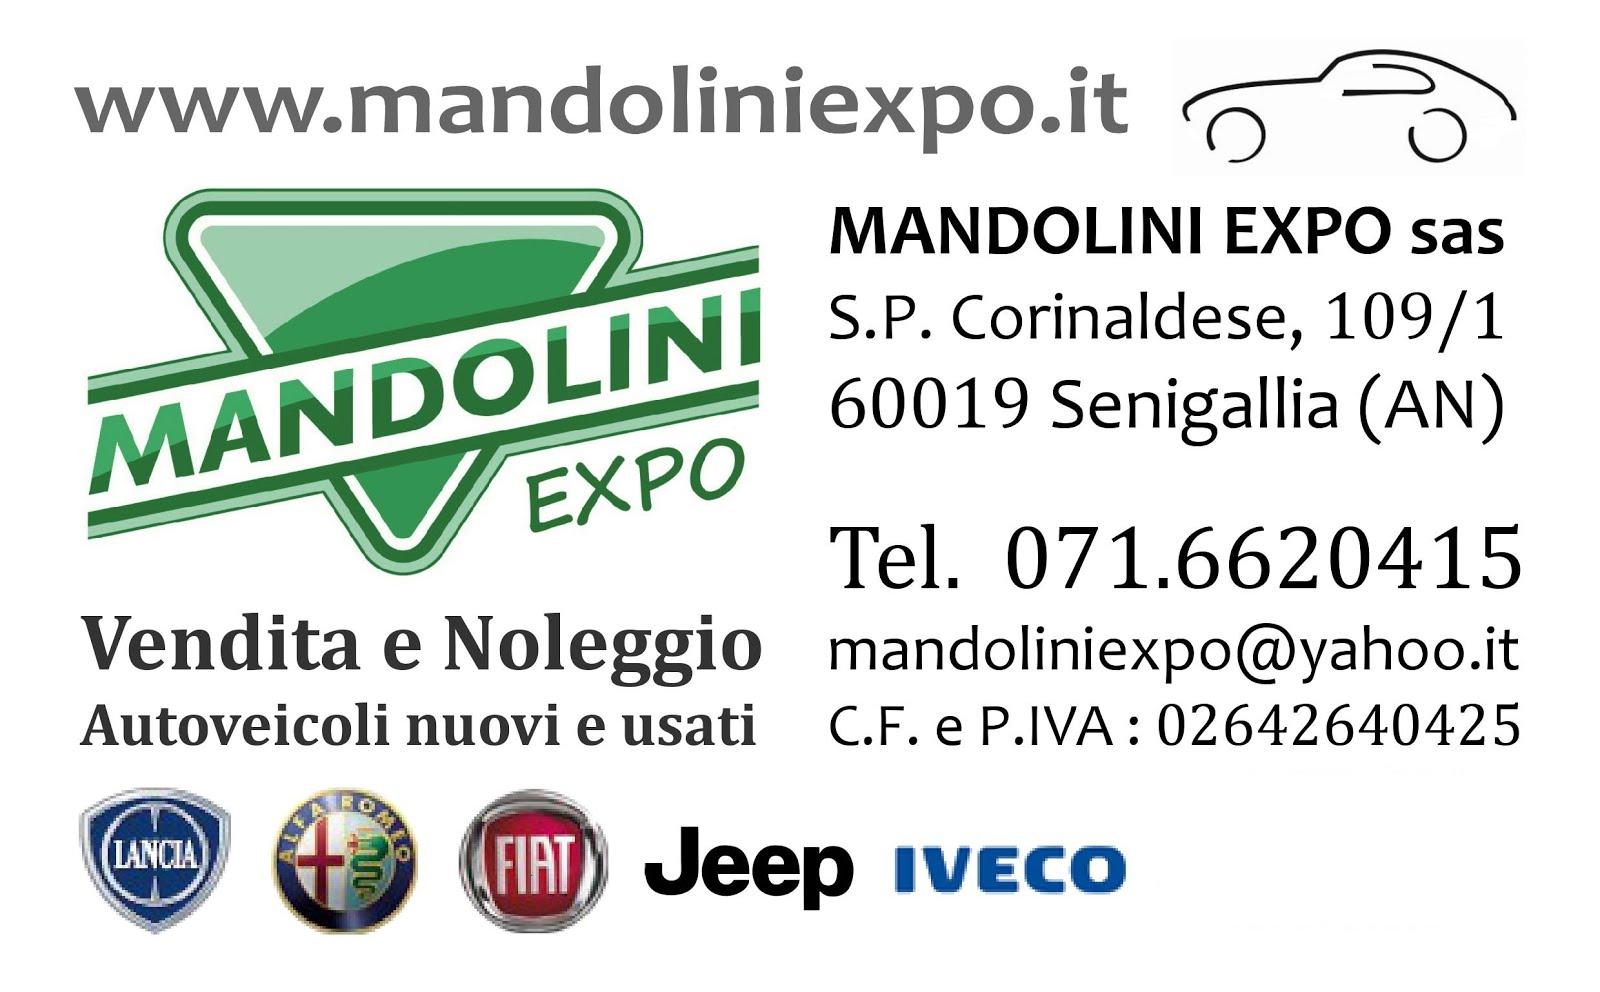 MANDOLINI EXPO sas